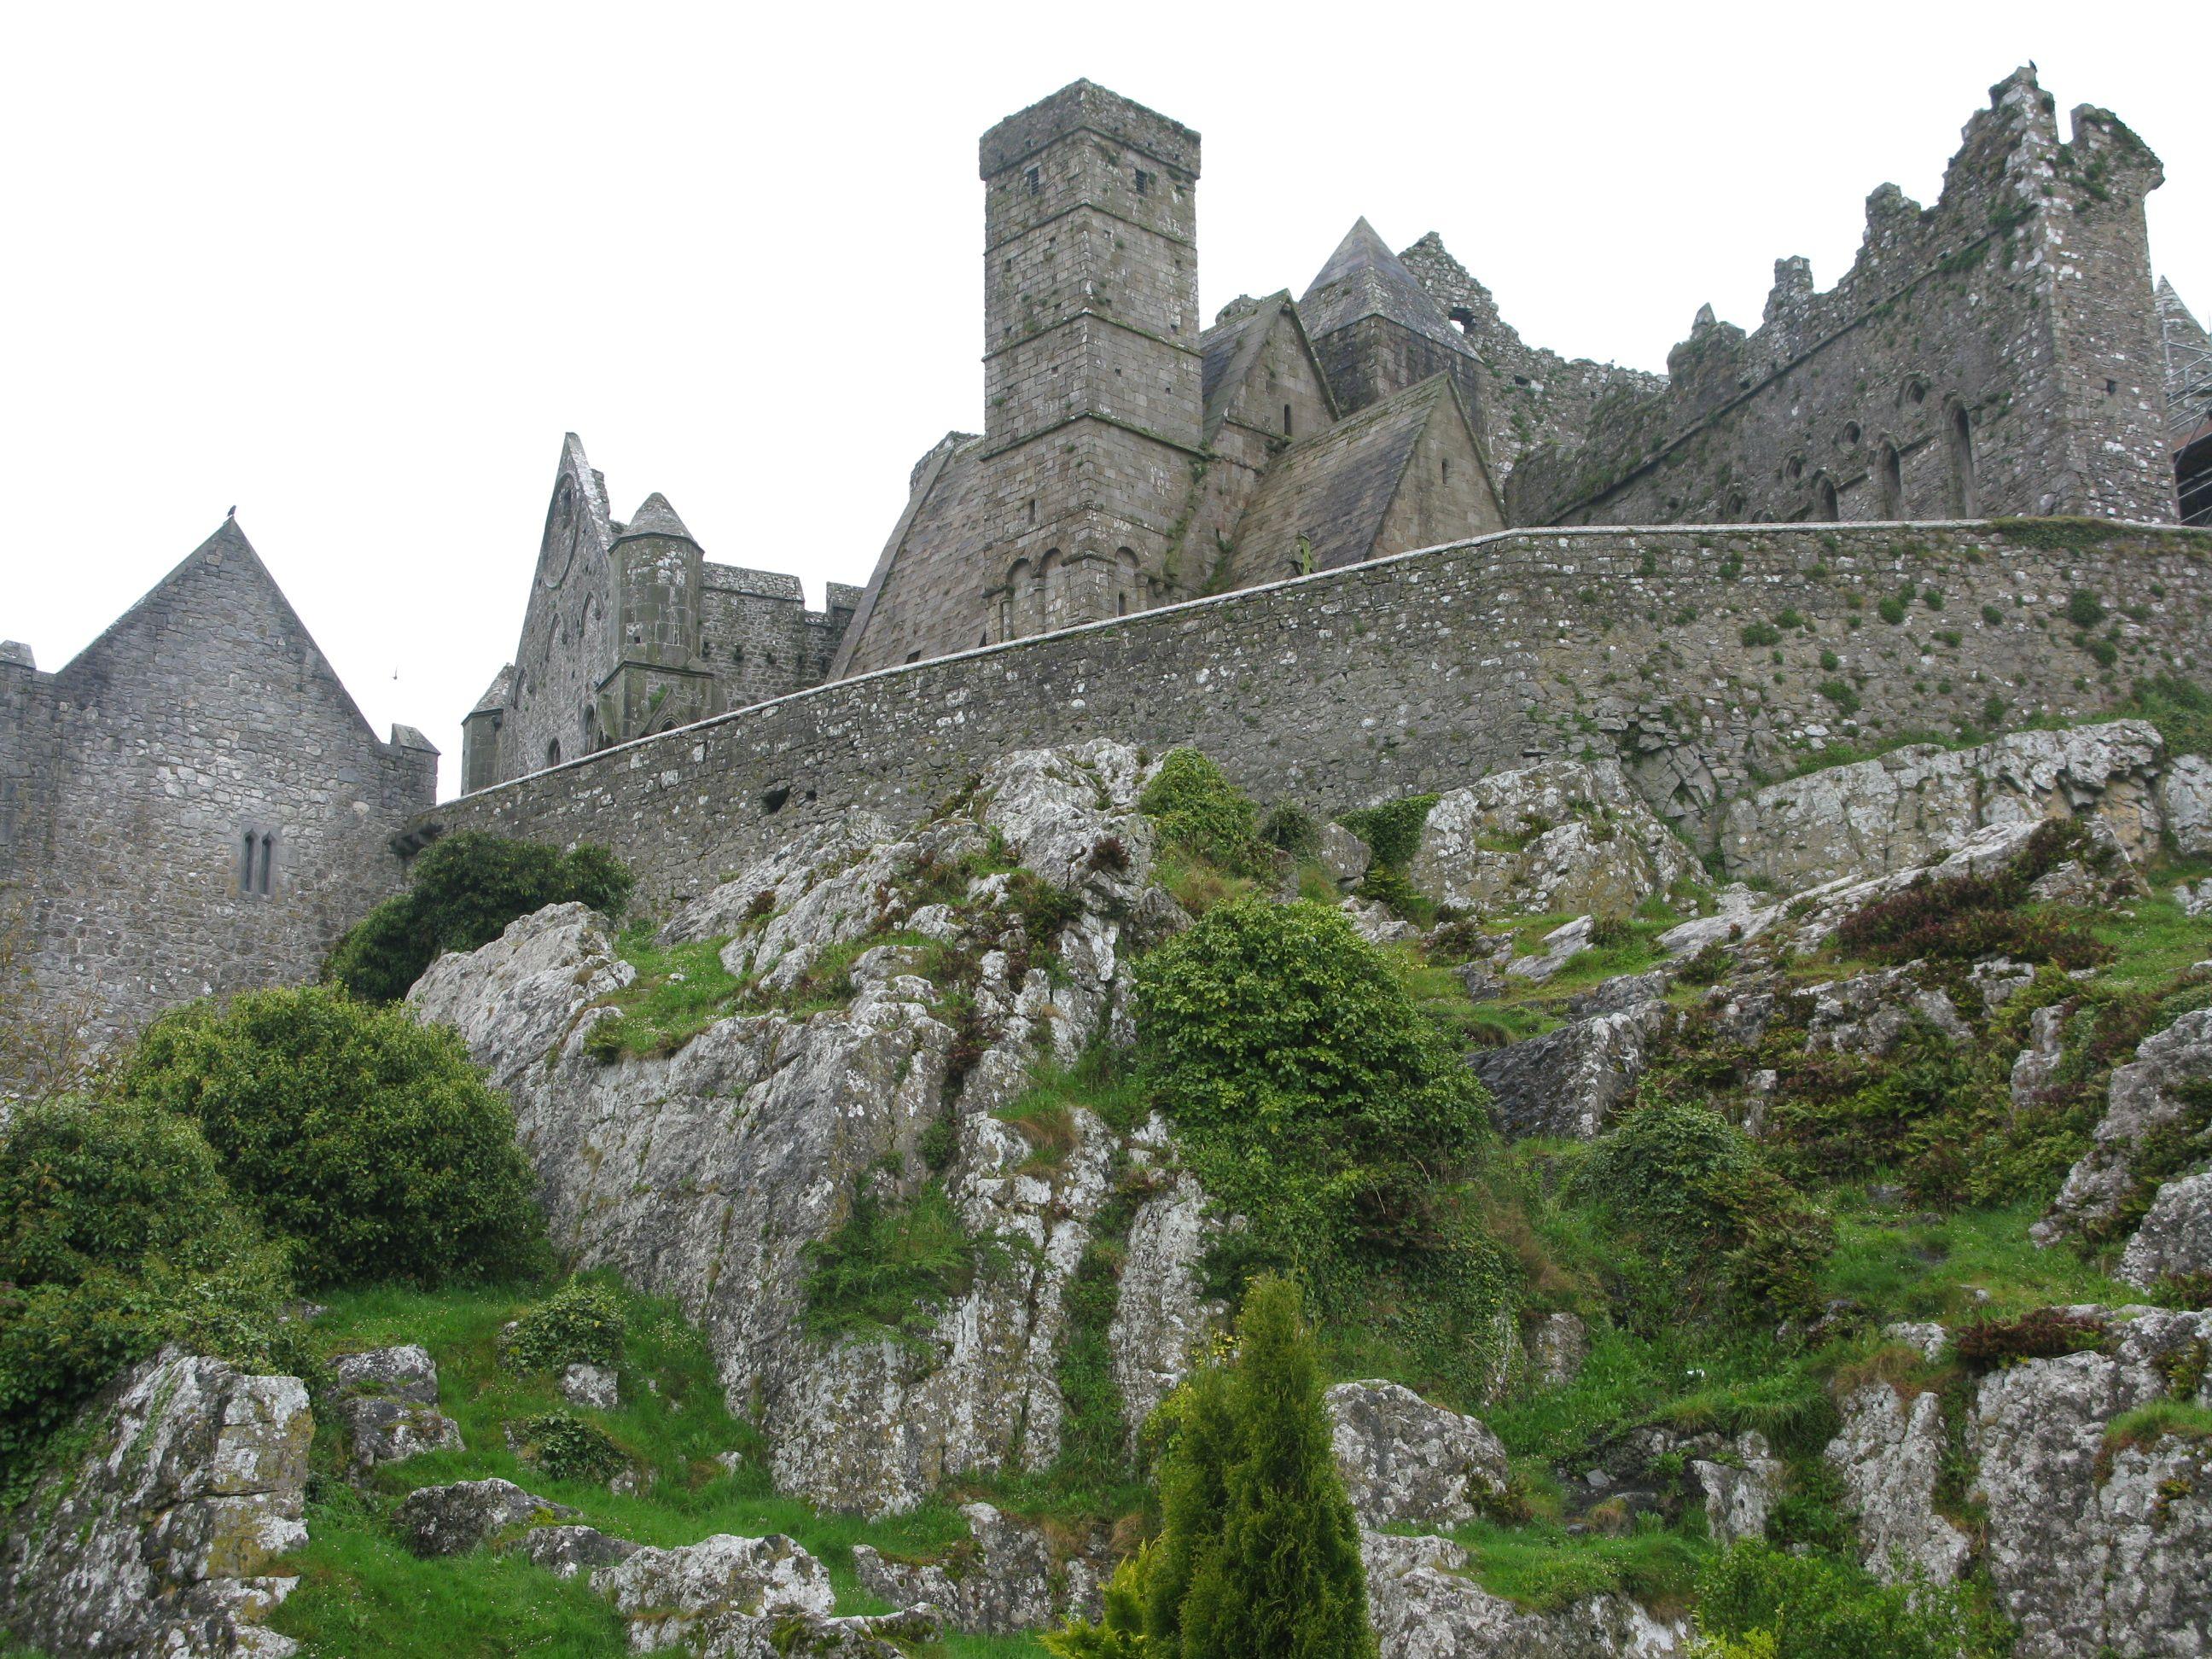 cashel-rock-castle | Castles, Ireland and Vacation destinations